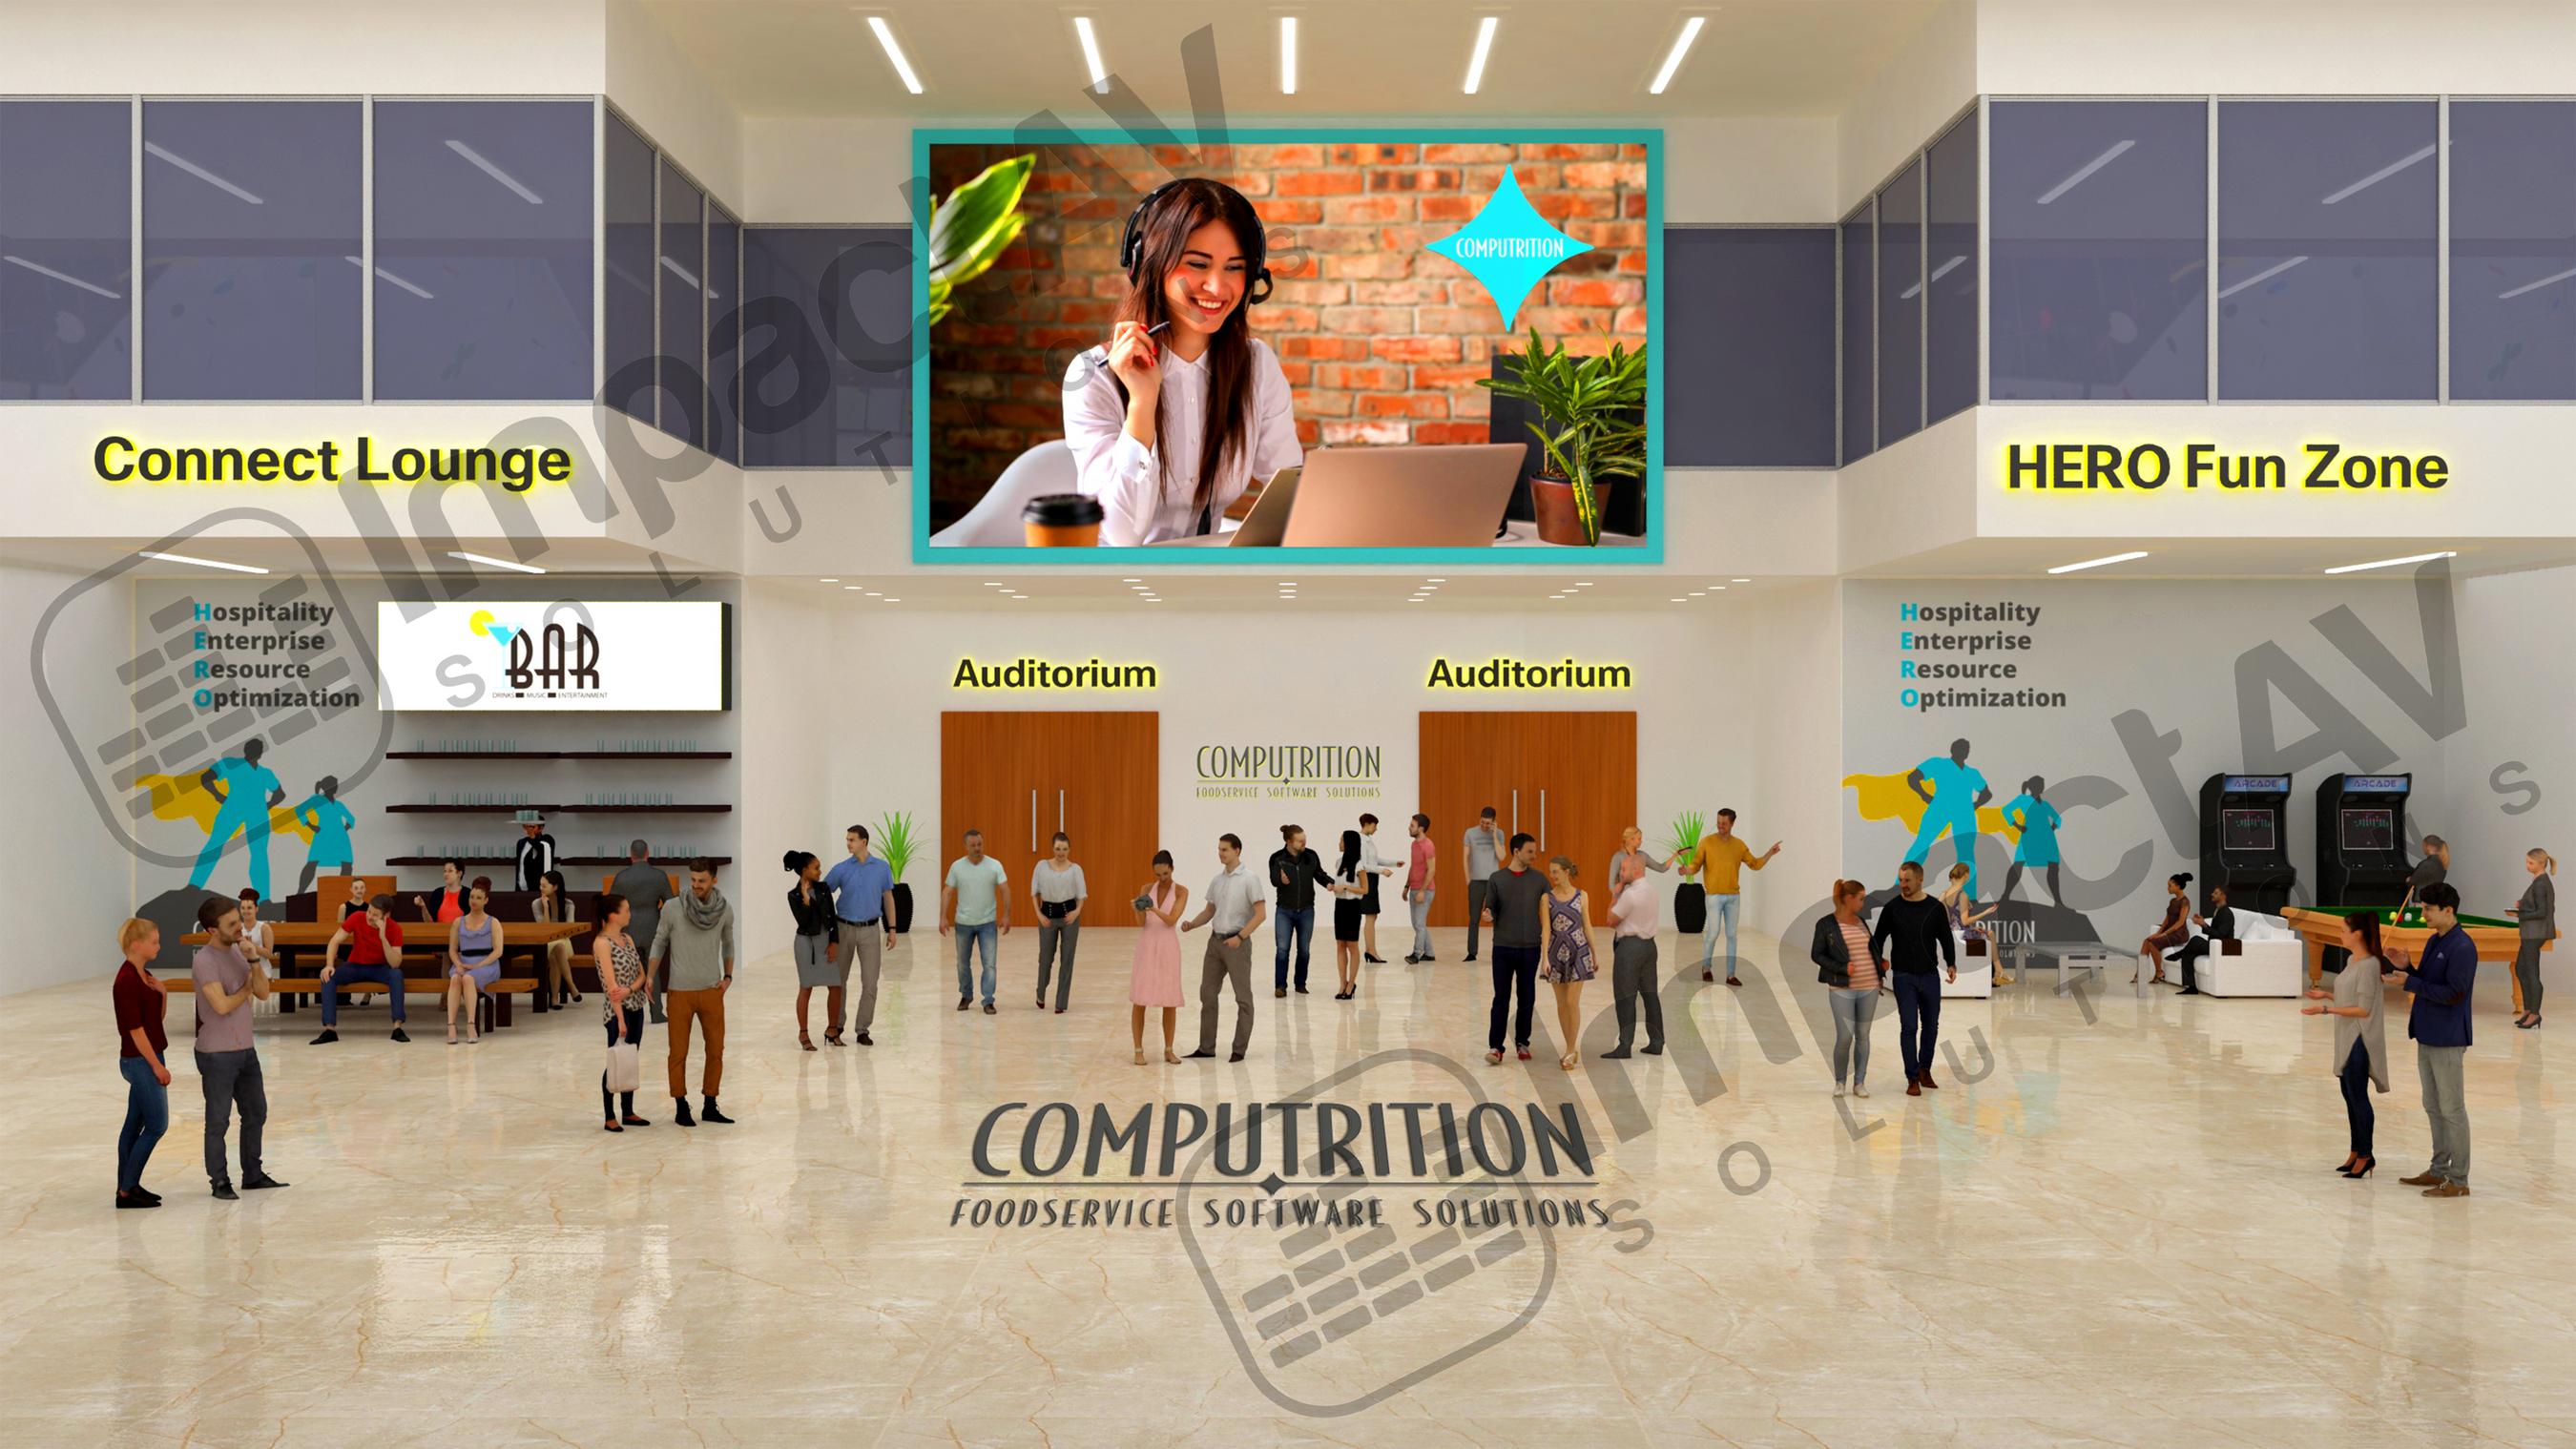 Computrition Lobby